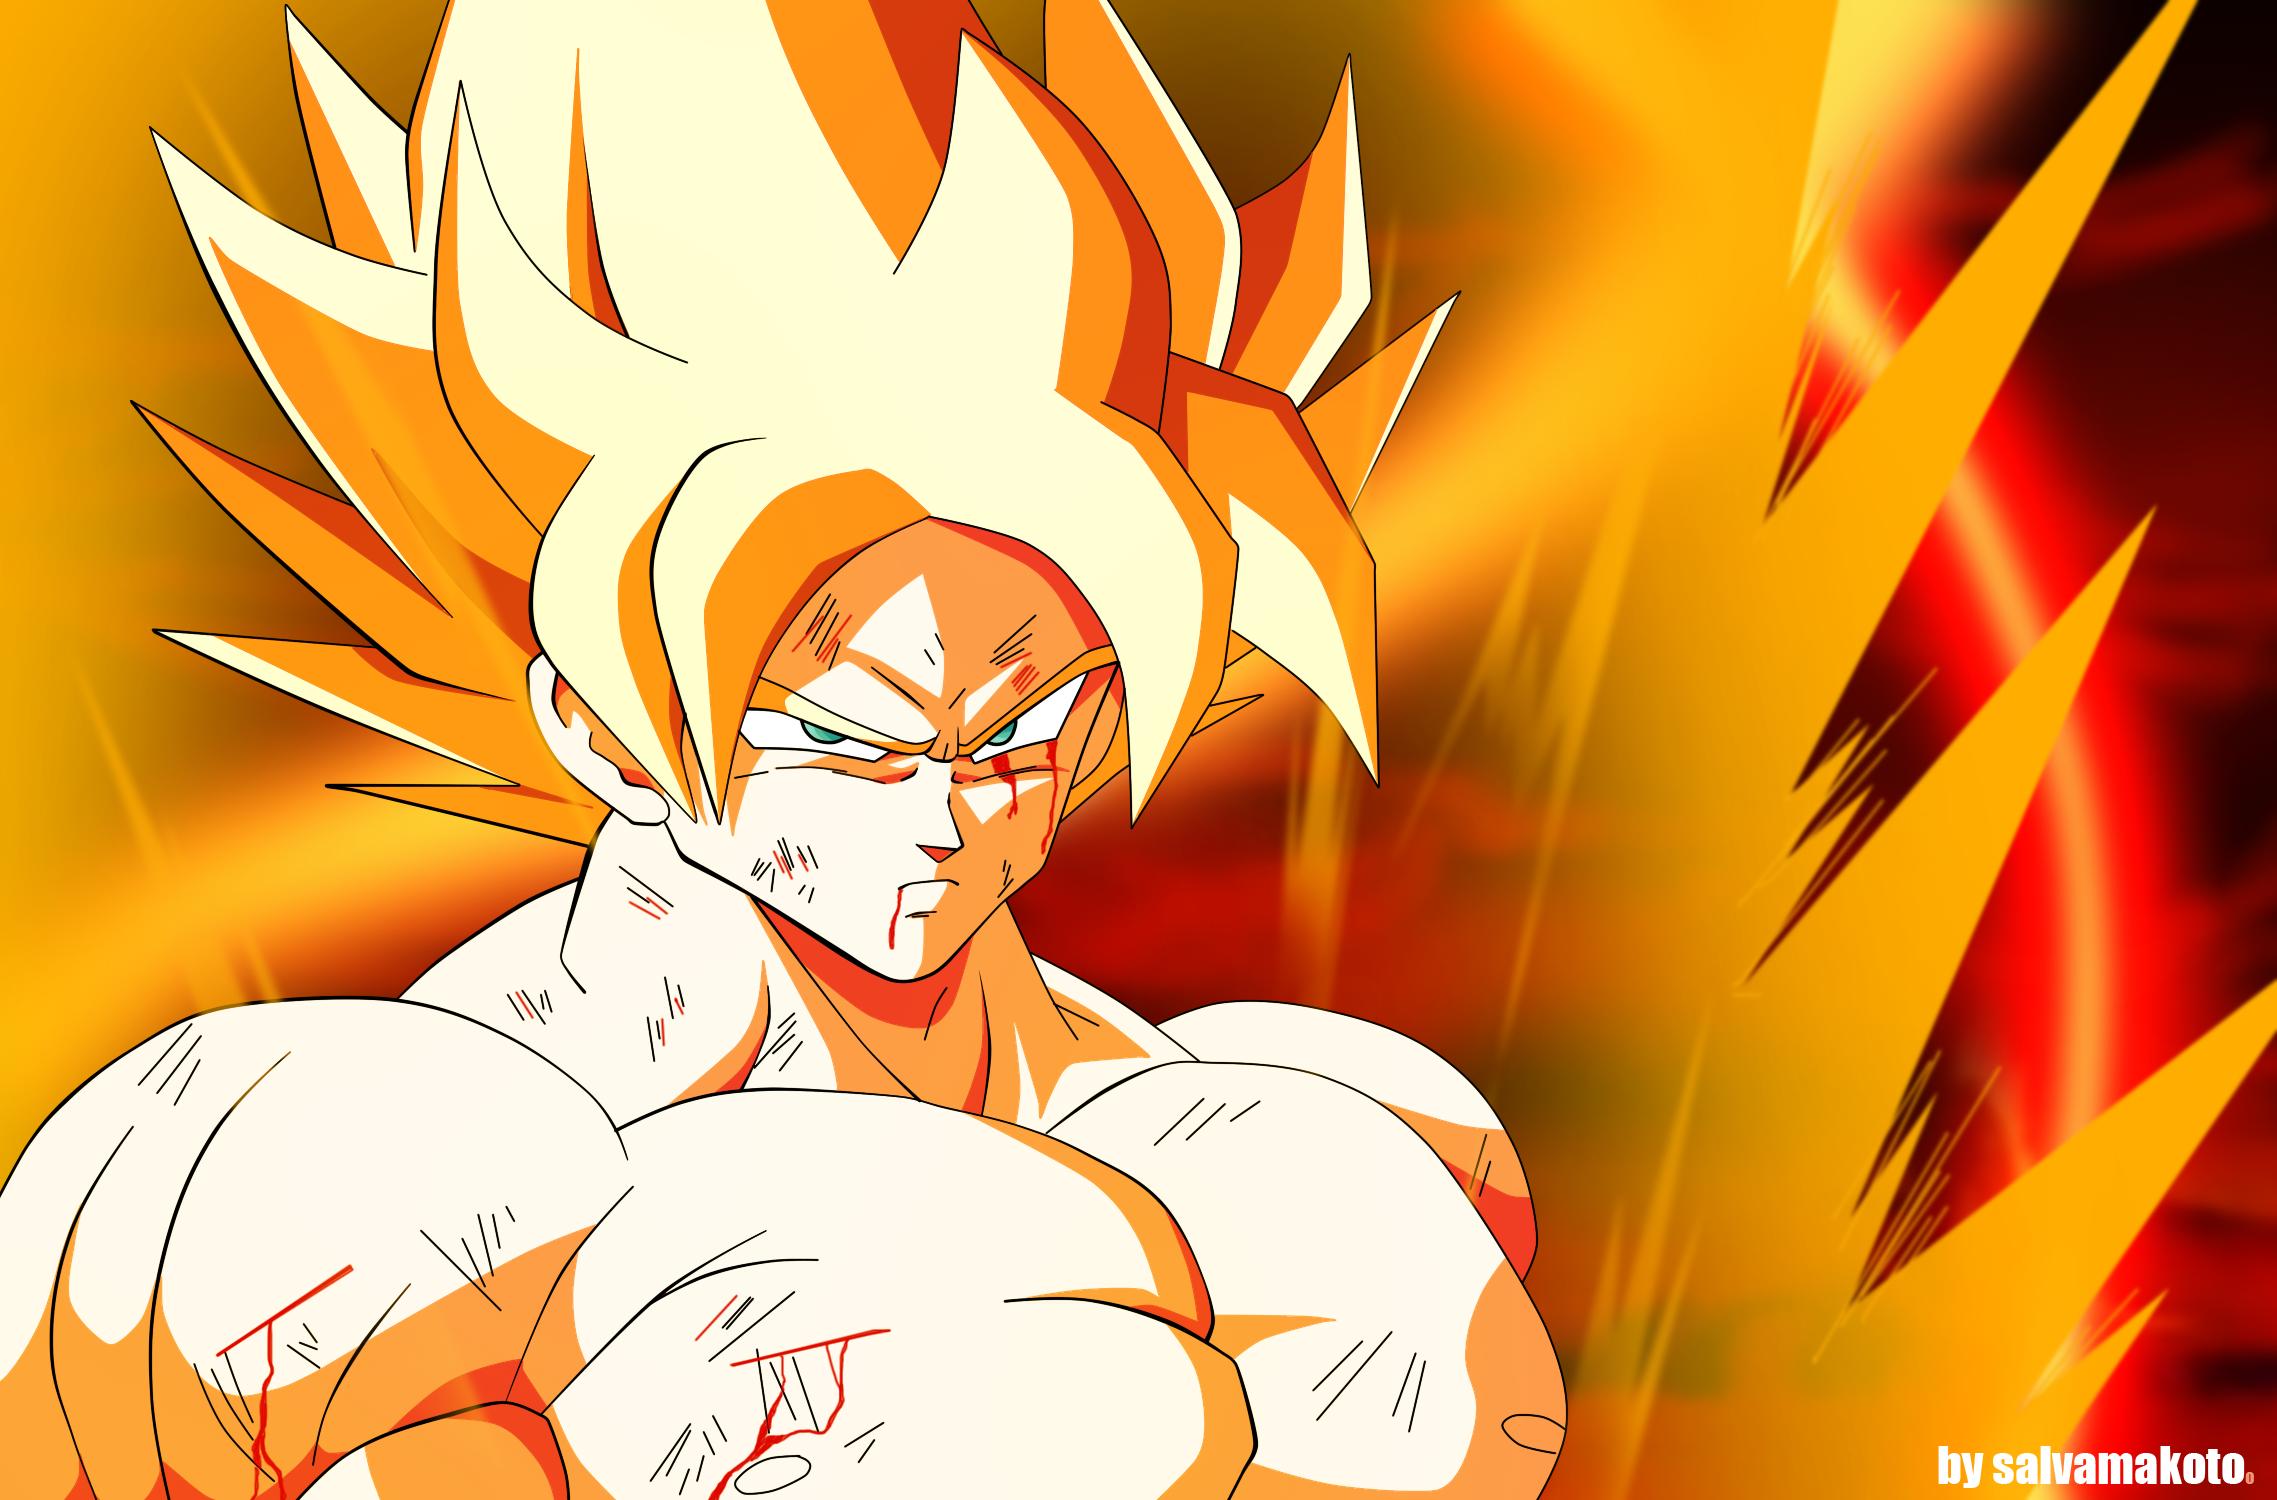 Ask vegeta breigh vegeta deviantart - Goku super sayan 5 ...